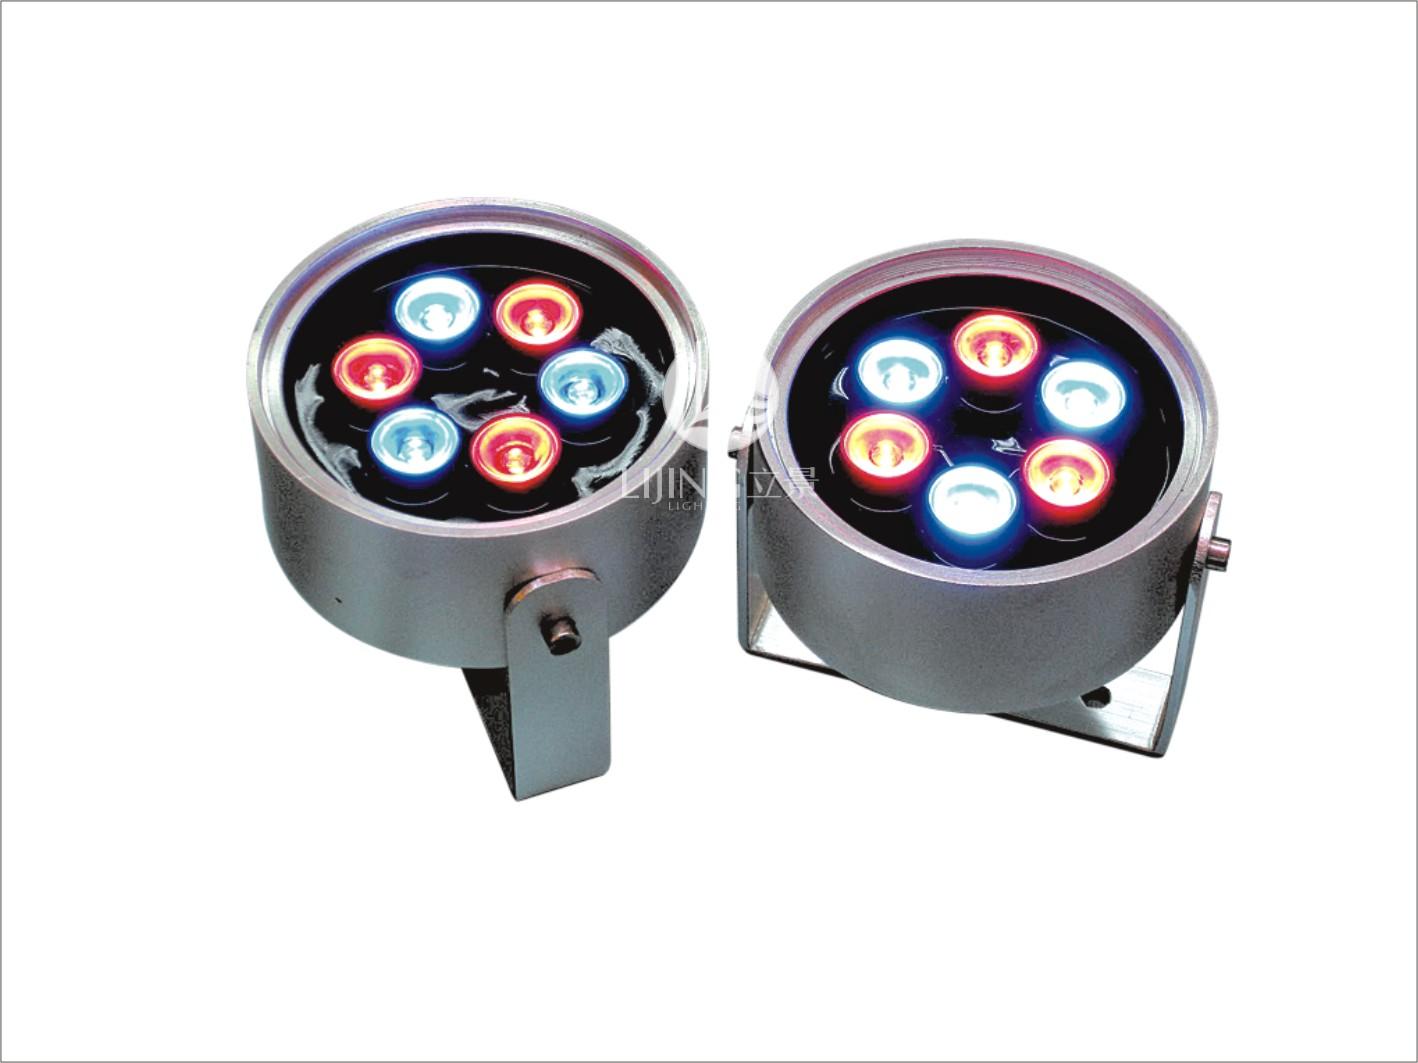 led大功率圆形7w投光灯 led大功率灯具 led投光灯 大功率投光灯